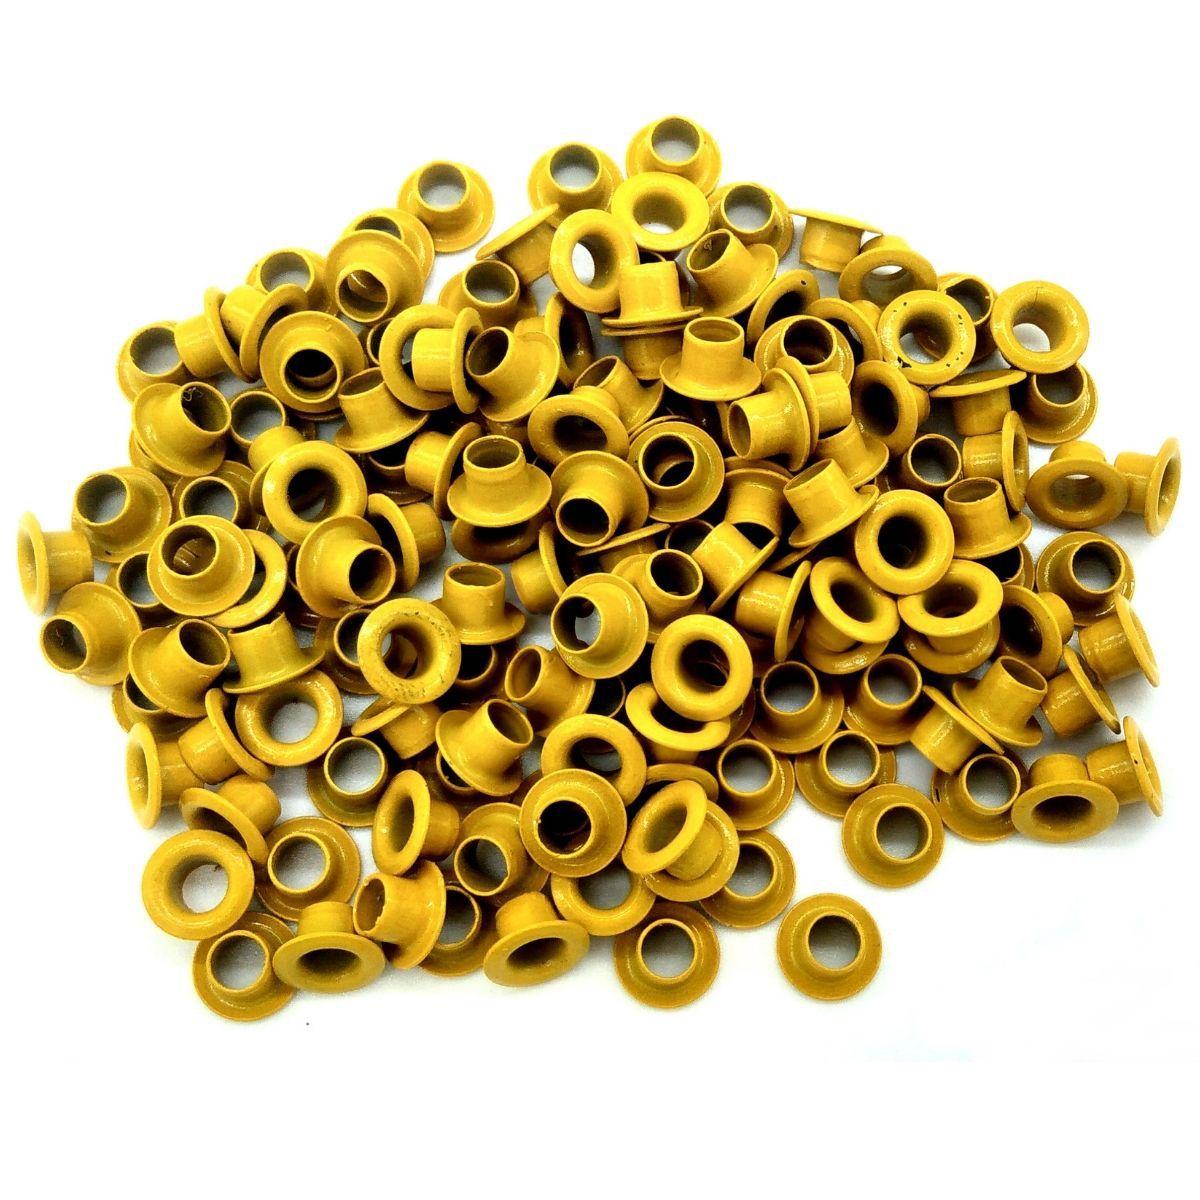 Ilhós Alumínio Amarelo Nº 54 8mm de diâmetro externo